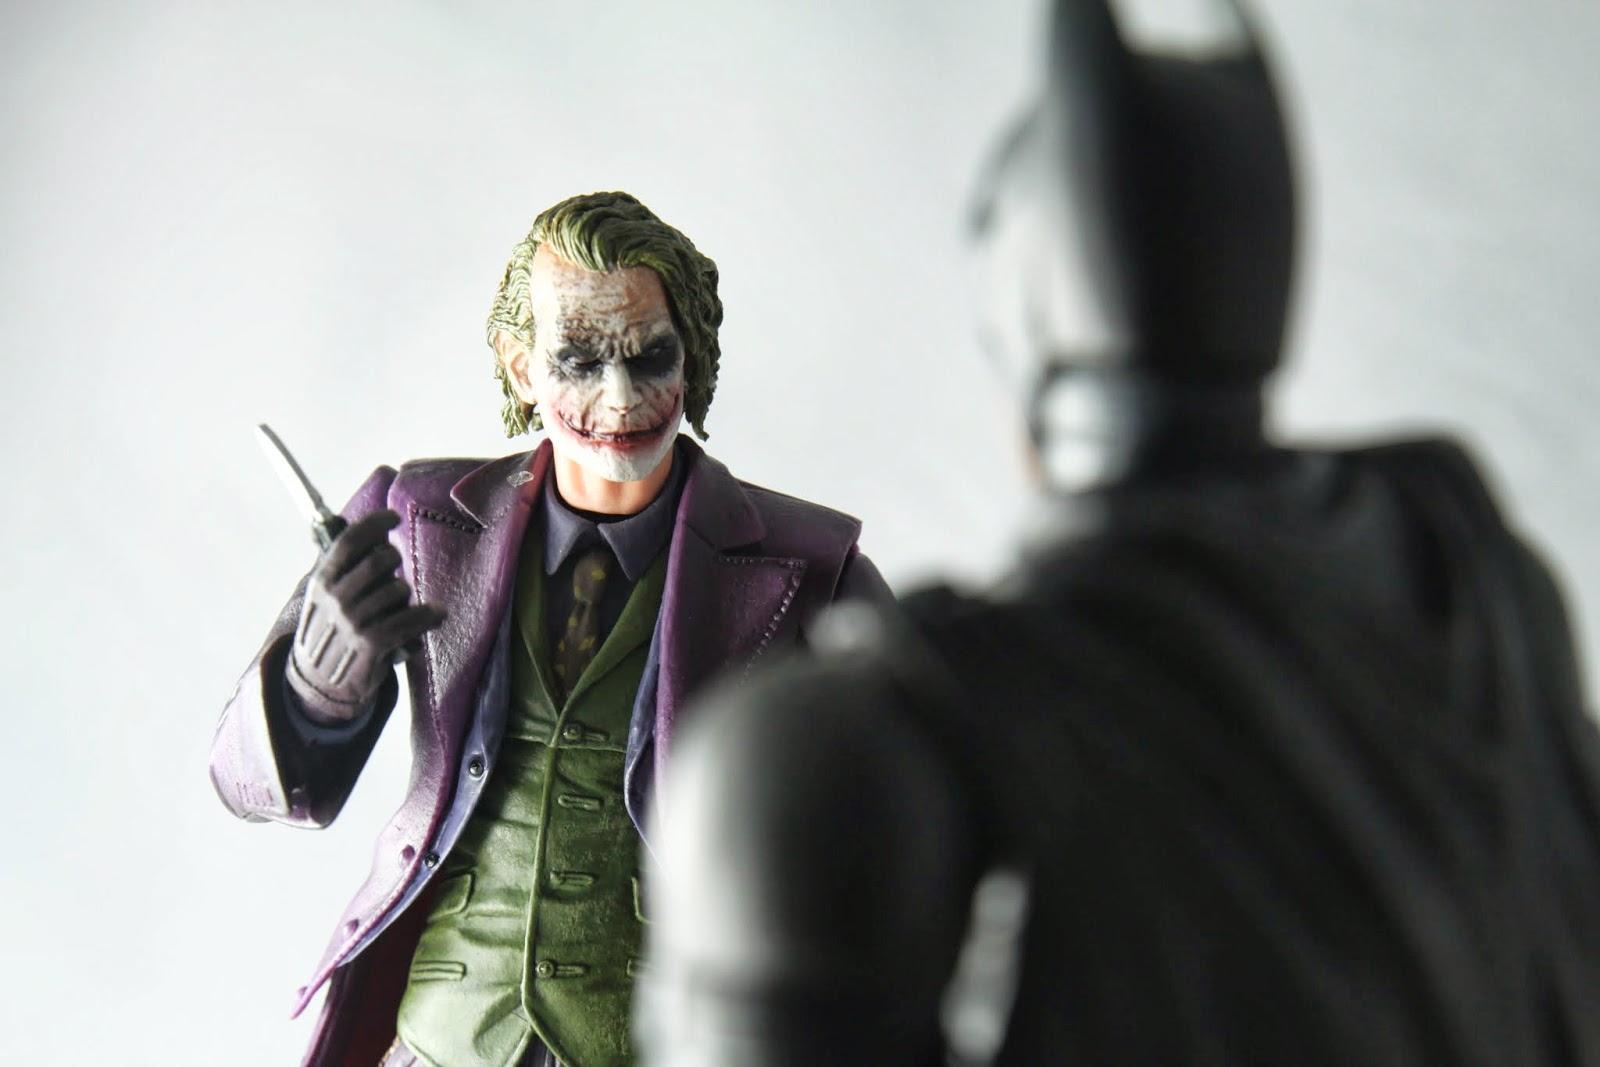 Bats! You complete me!!!!